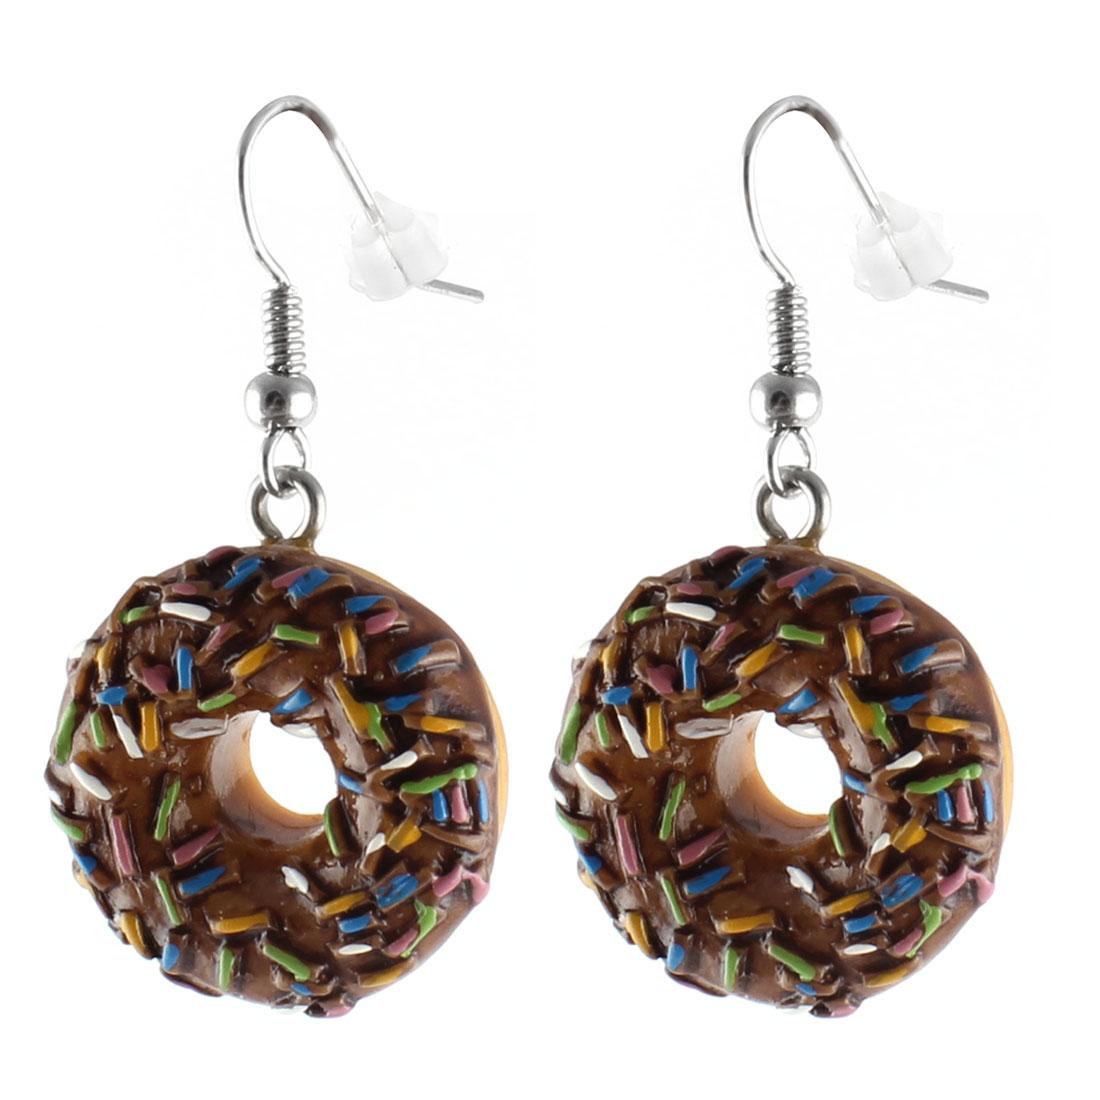 Pair Colorful Plastic Doughnut Pendant Dangling Metal Fish Hook Ear Drops Earrings Eardrops